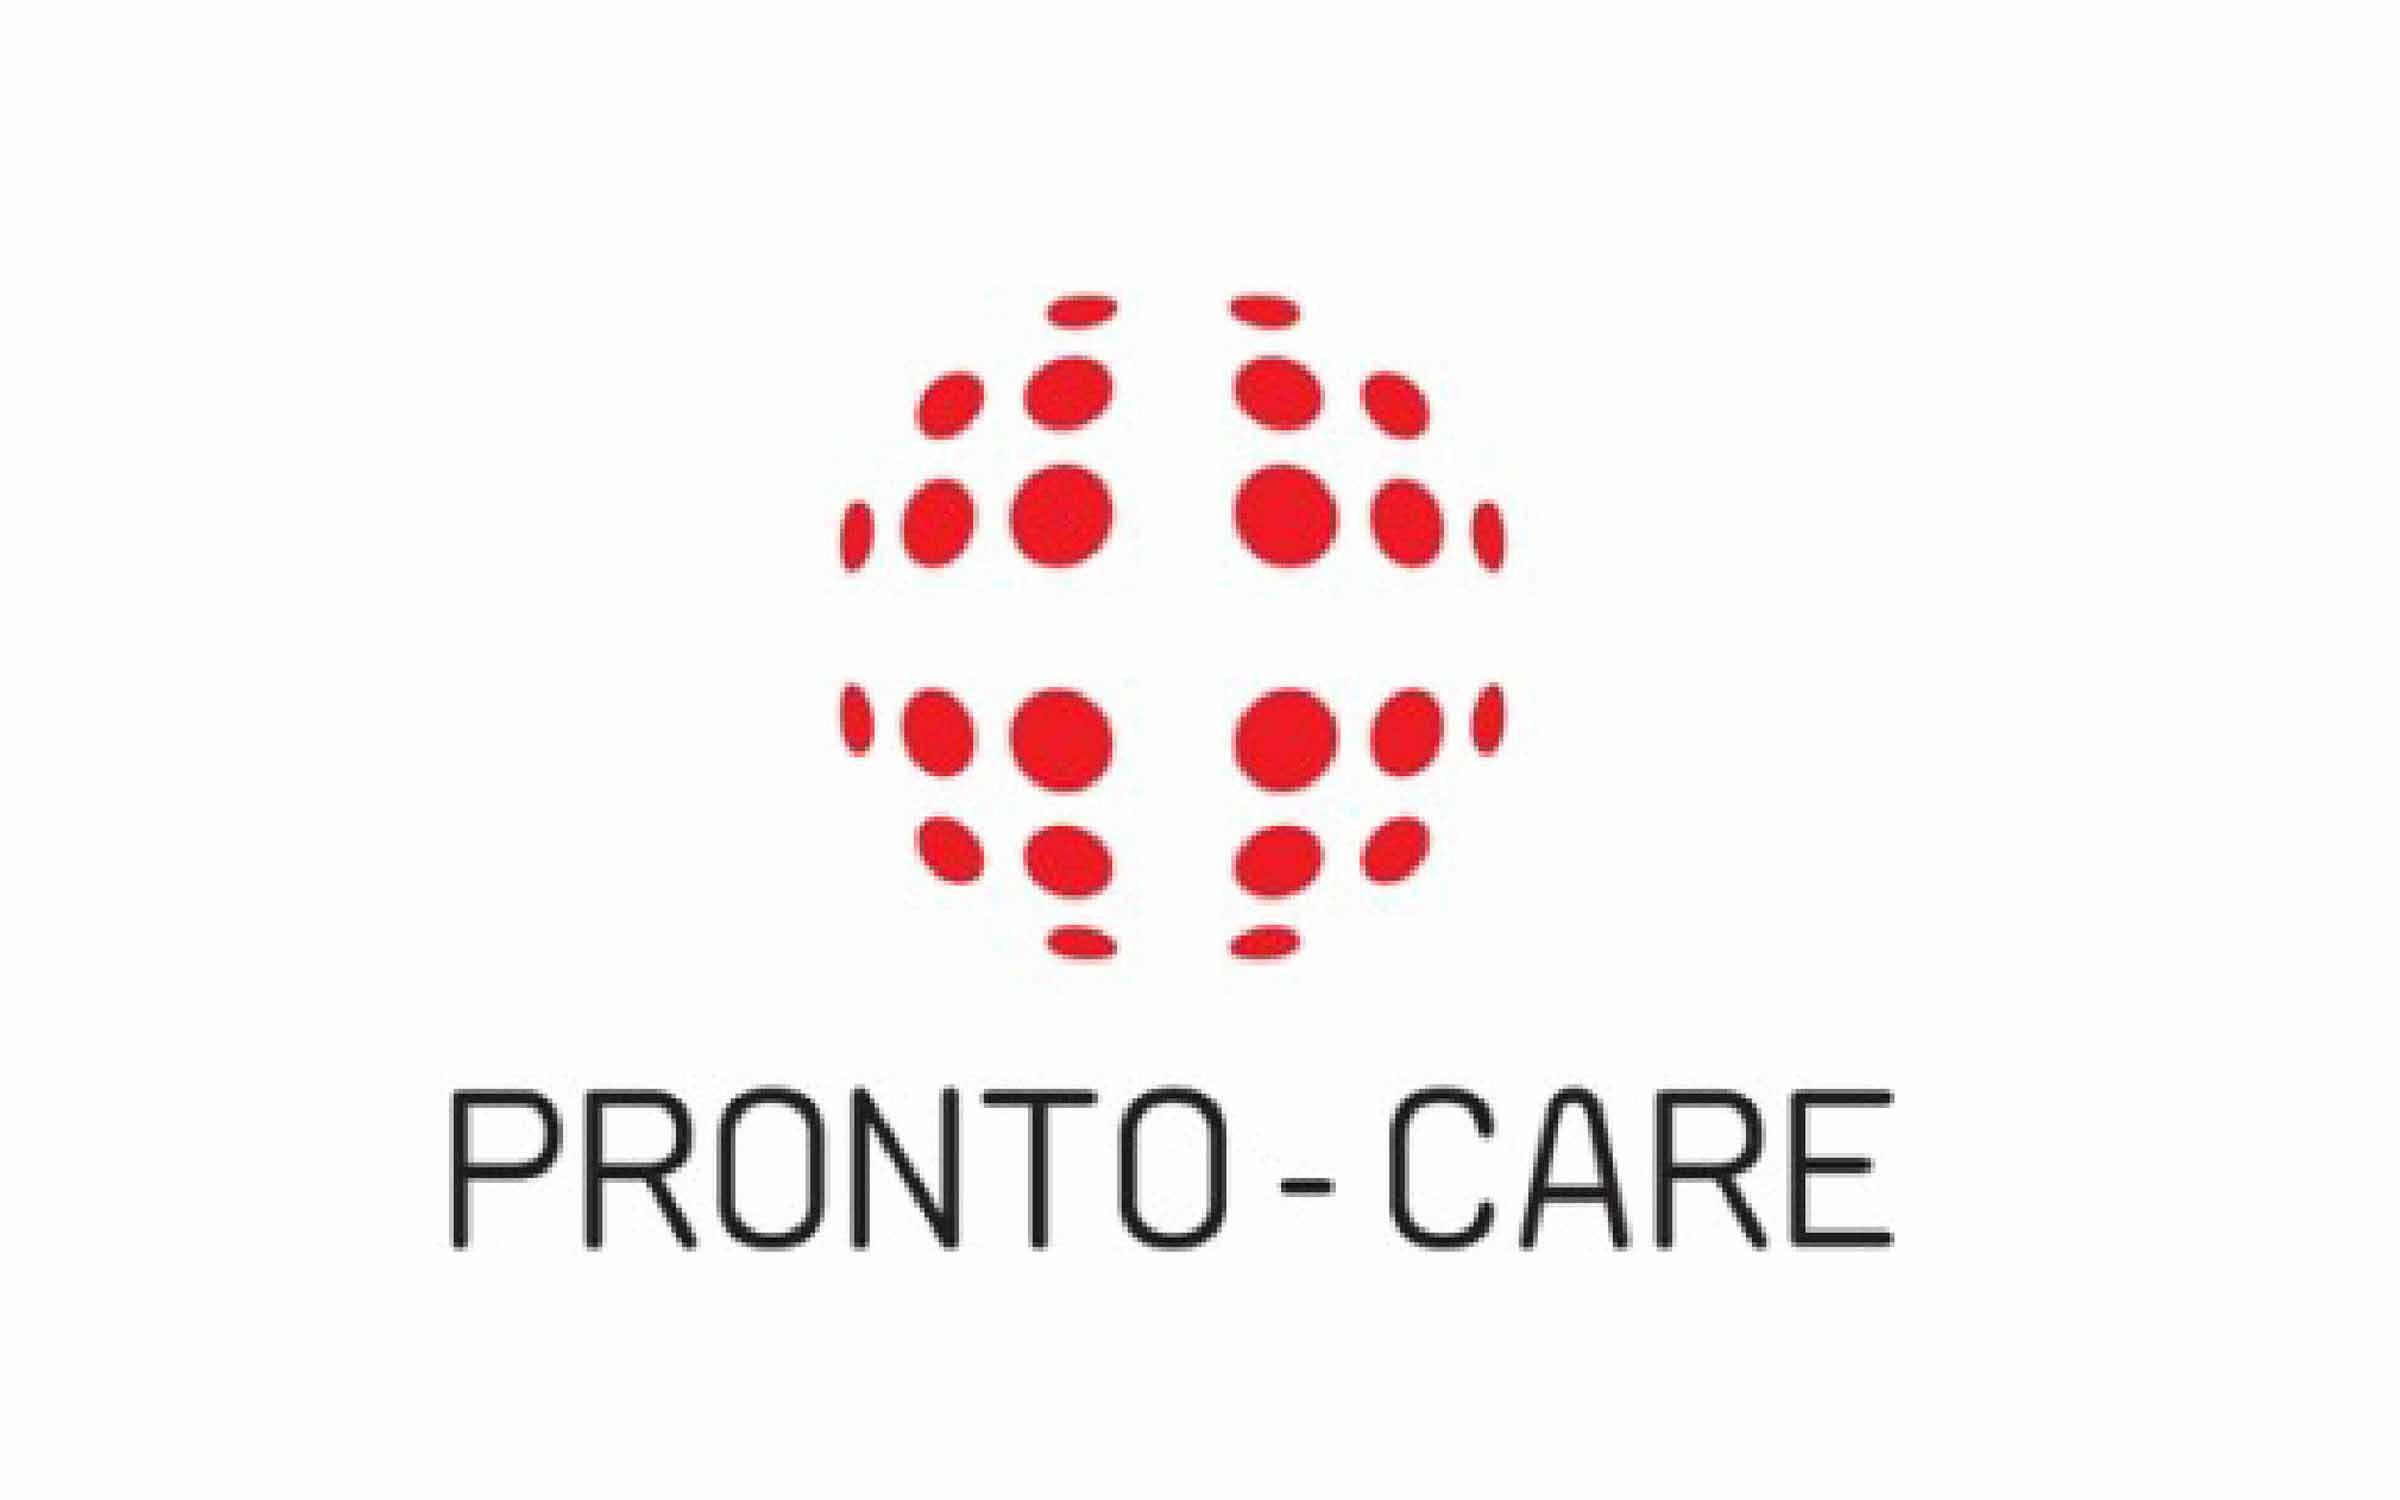 Fondo Assicurativo Pronto Care - Studio Odontoiatrico e Ortodontico Paola Polacco